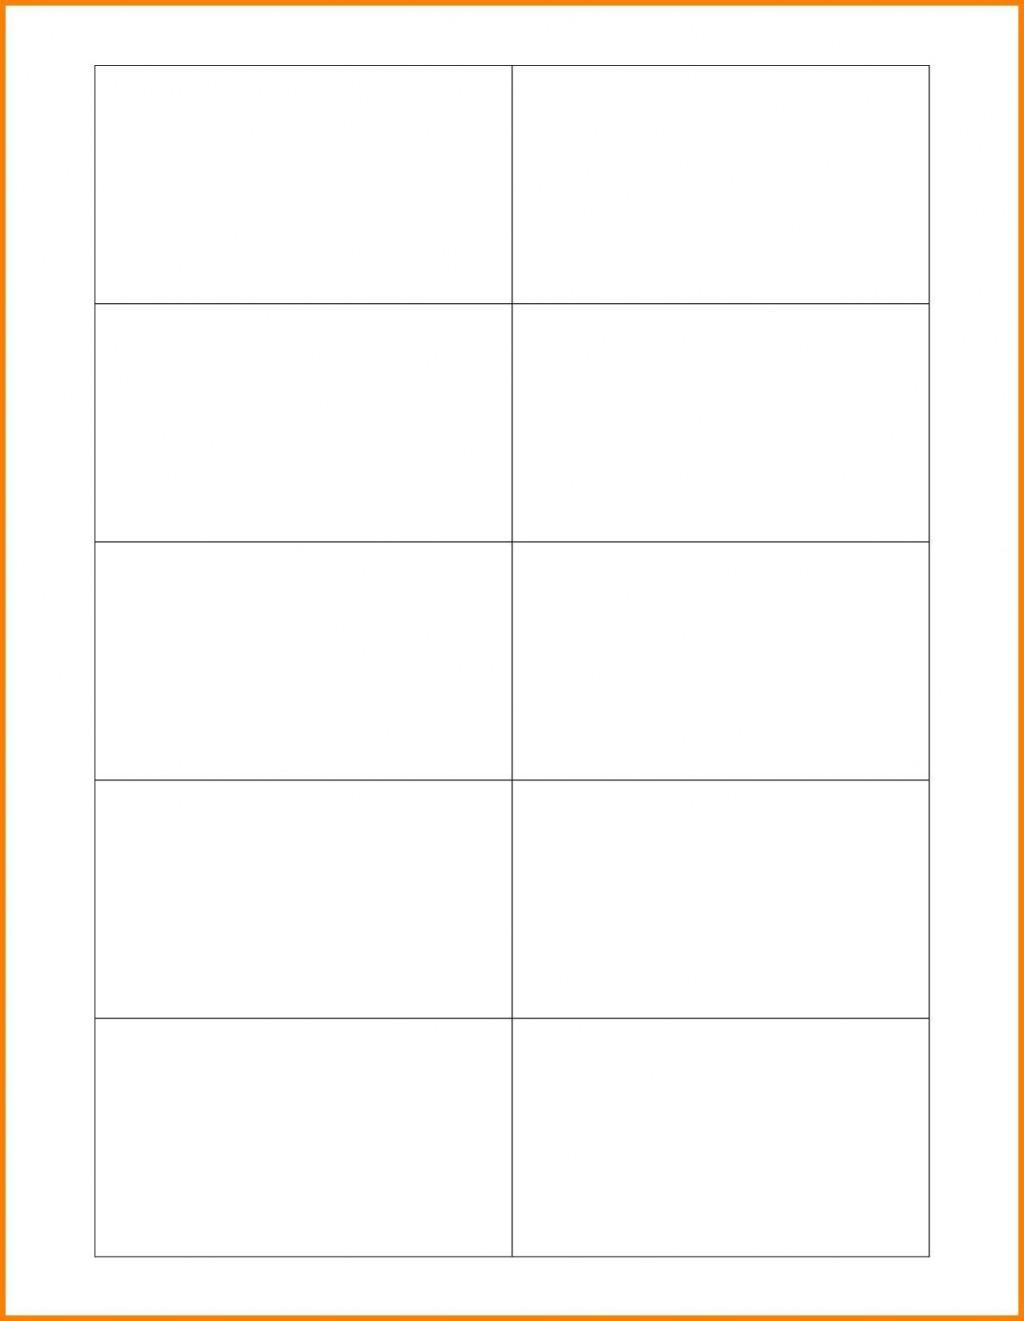 005 Unusual Free Simple Busines Card Template Word Sample Large